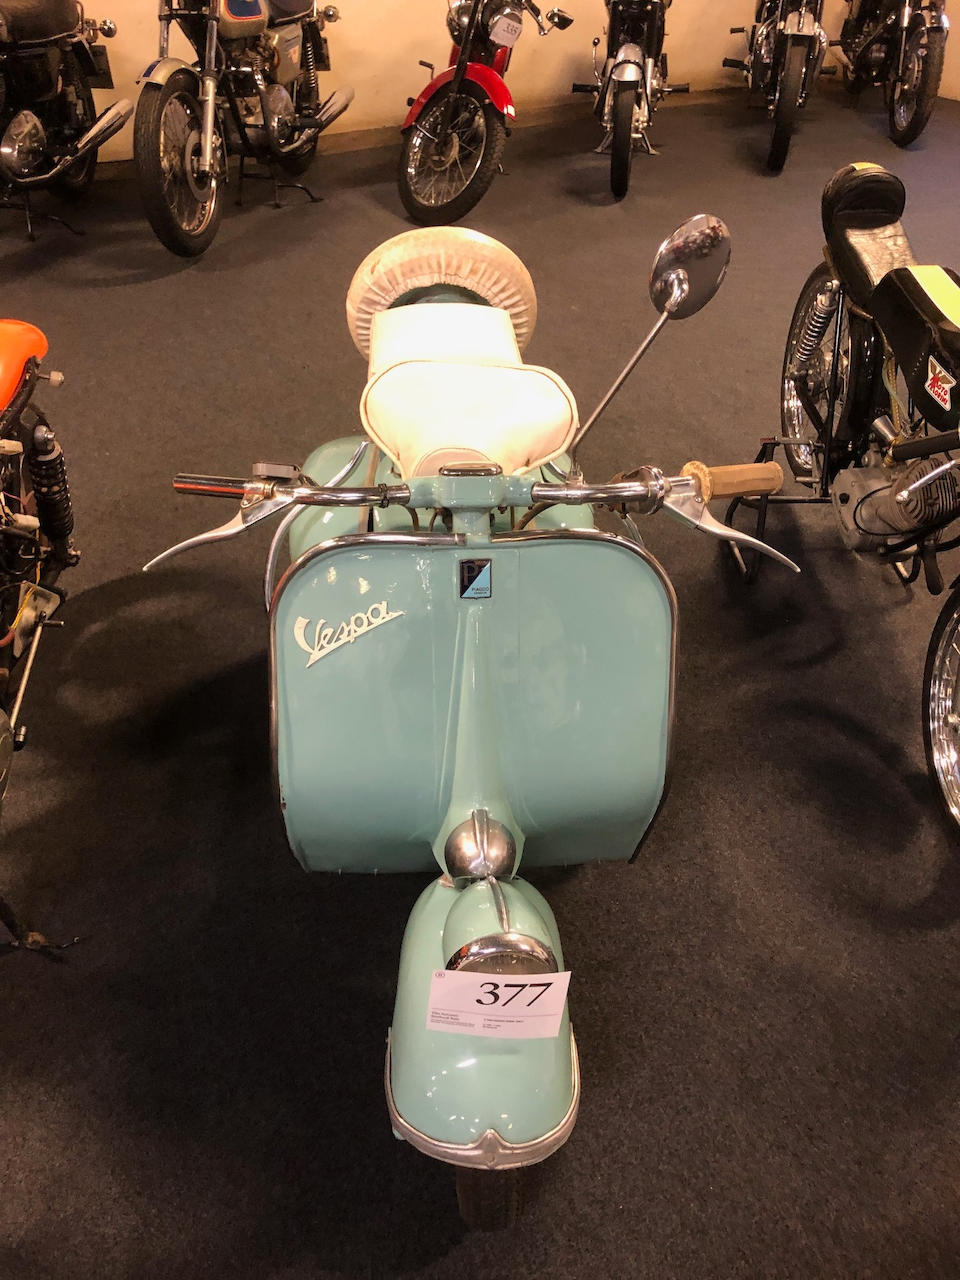 c.1953 Piaggio Vespa 125cc Frame no. VM19061933 Engine no. 062101VMM